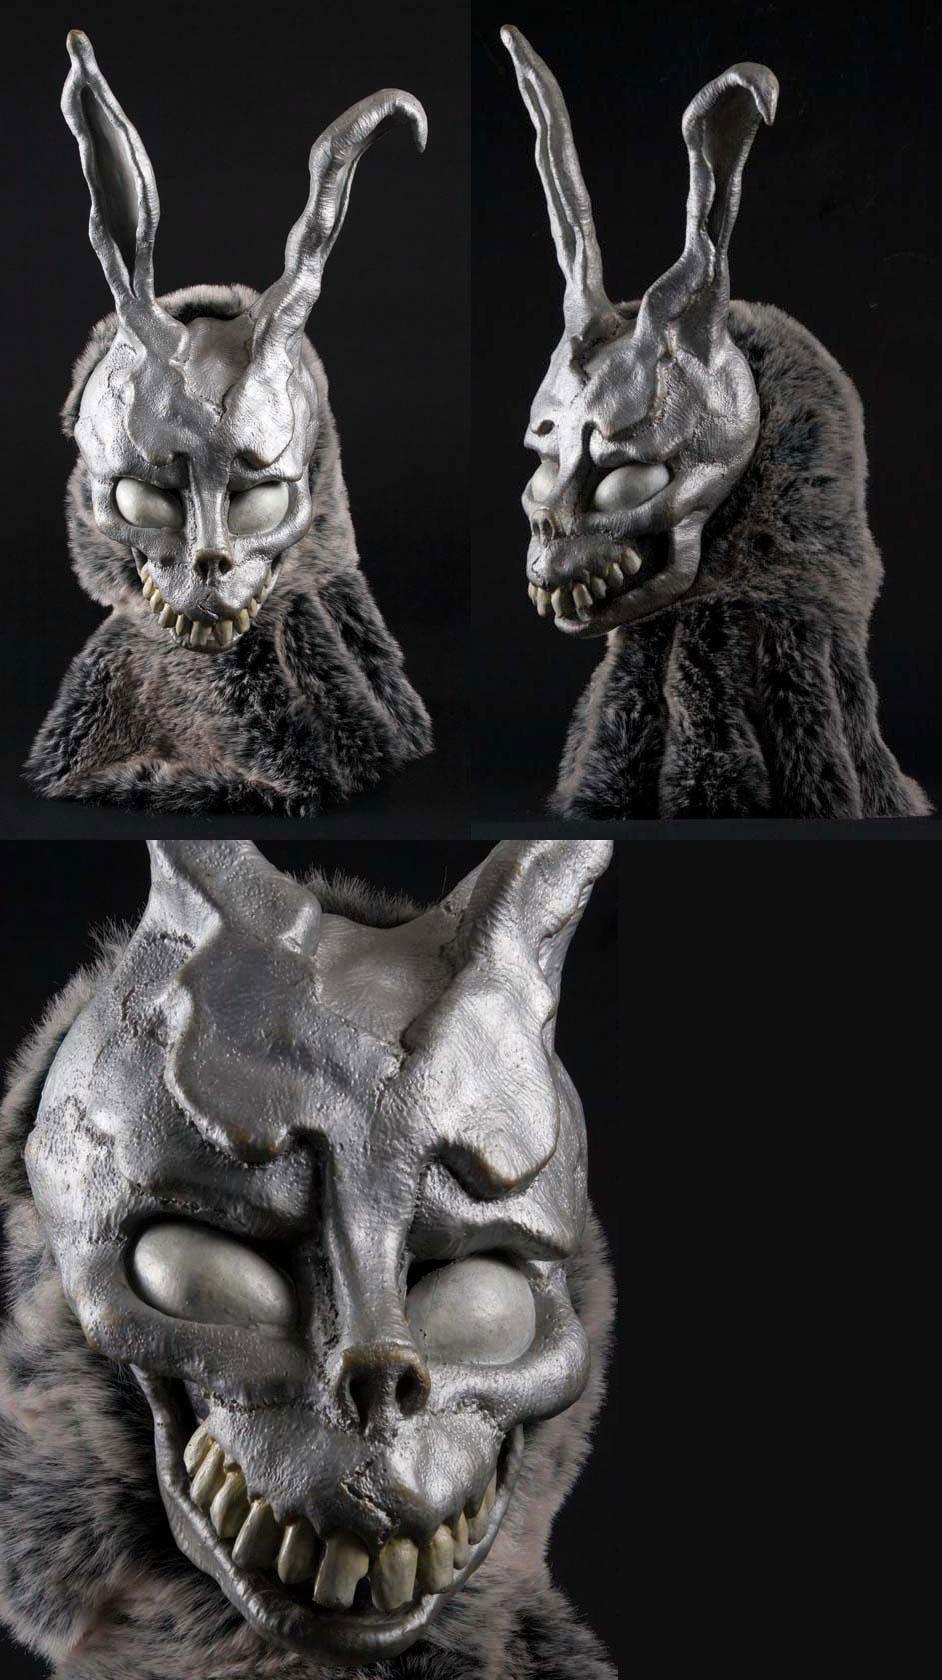 frank-the-rabbit-kirk-mask-auction3.jpg